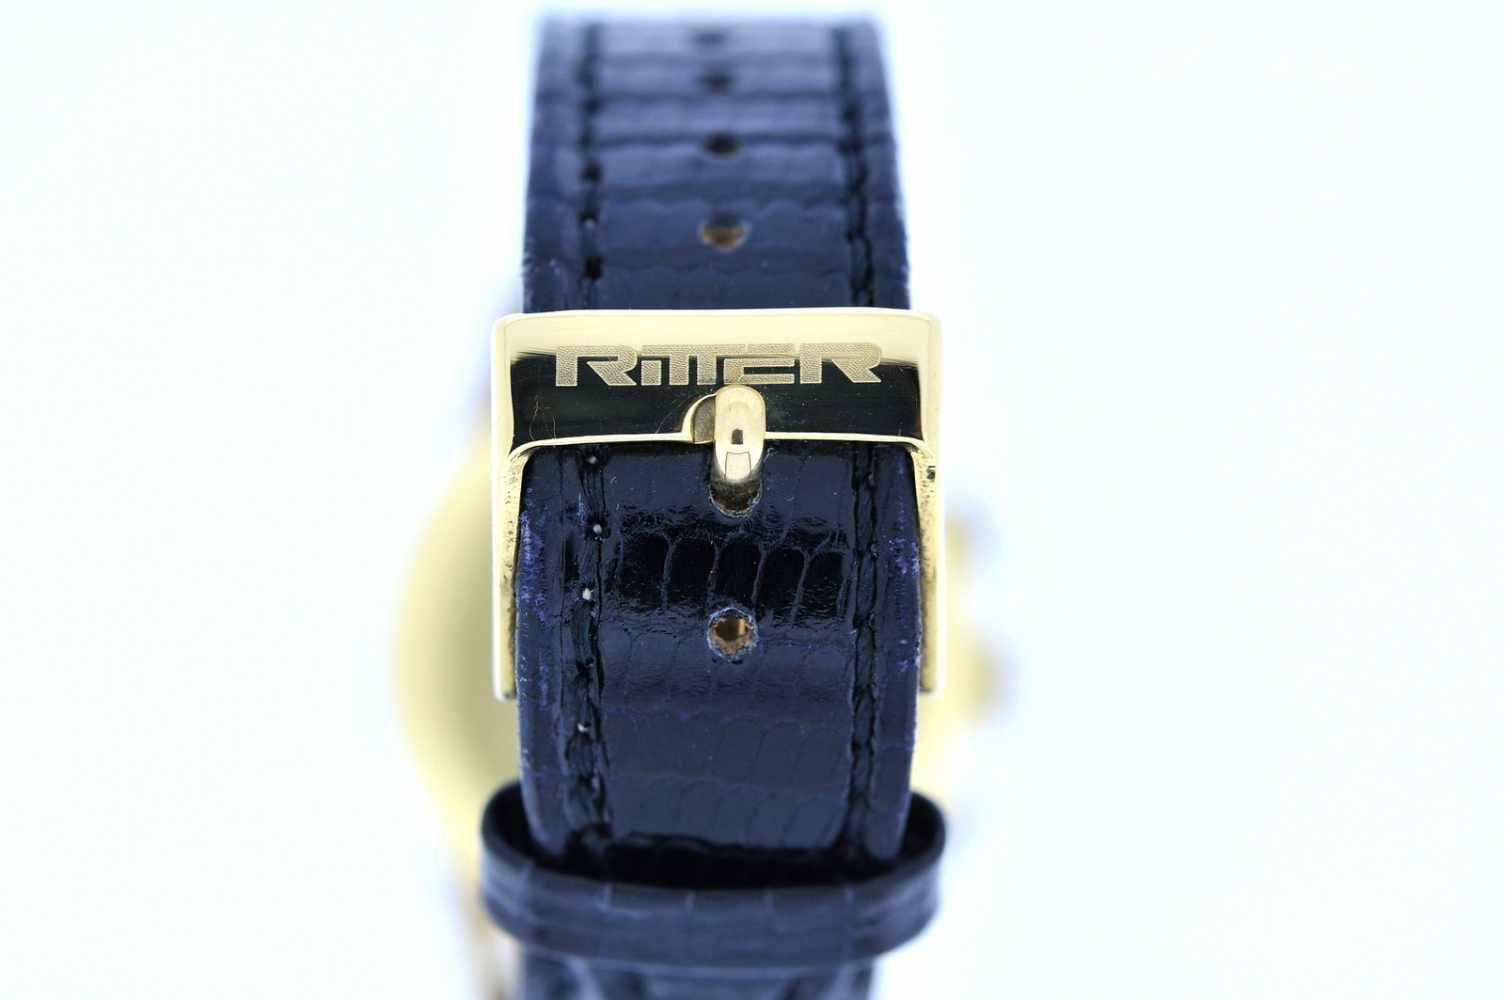 Gigandet Goldene 18karätige Armbanduhr an Lederband, Gigandet Wakmann, Chronograph, Stoppfunktion, - Bild 2 aus 5